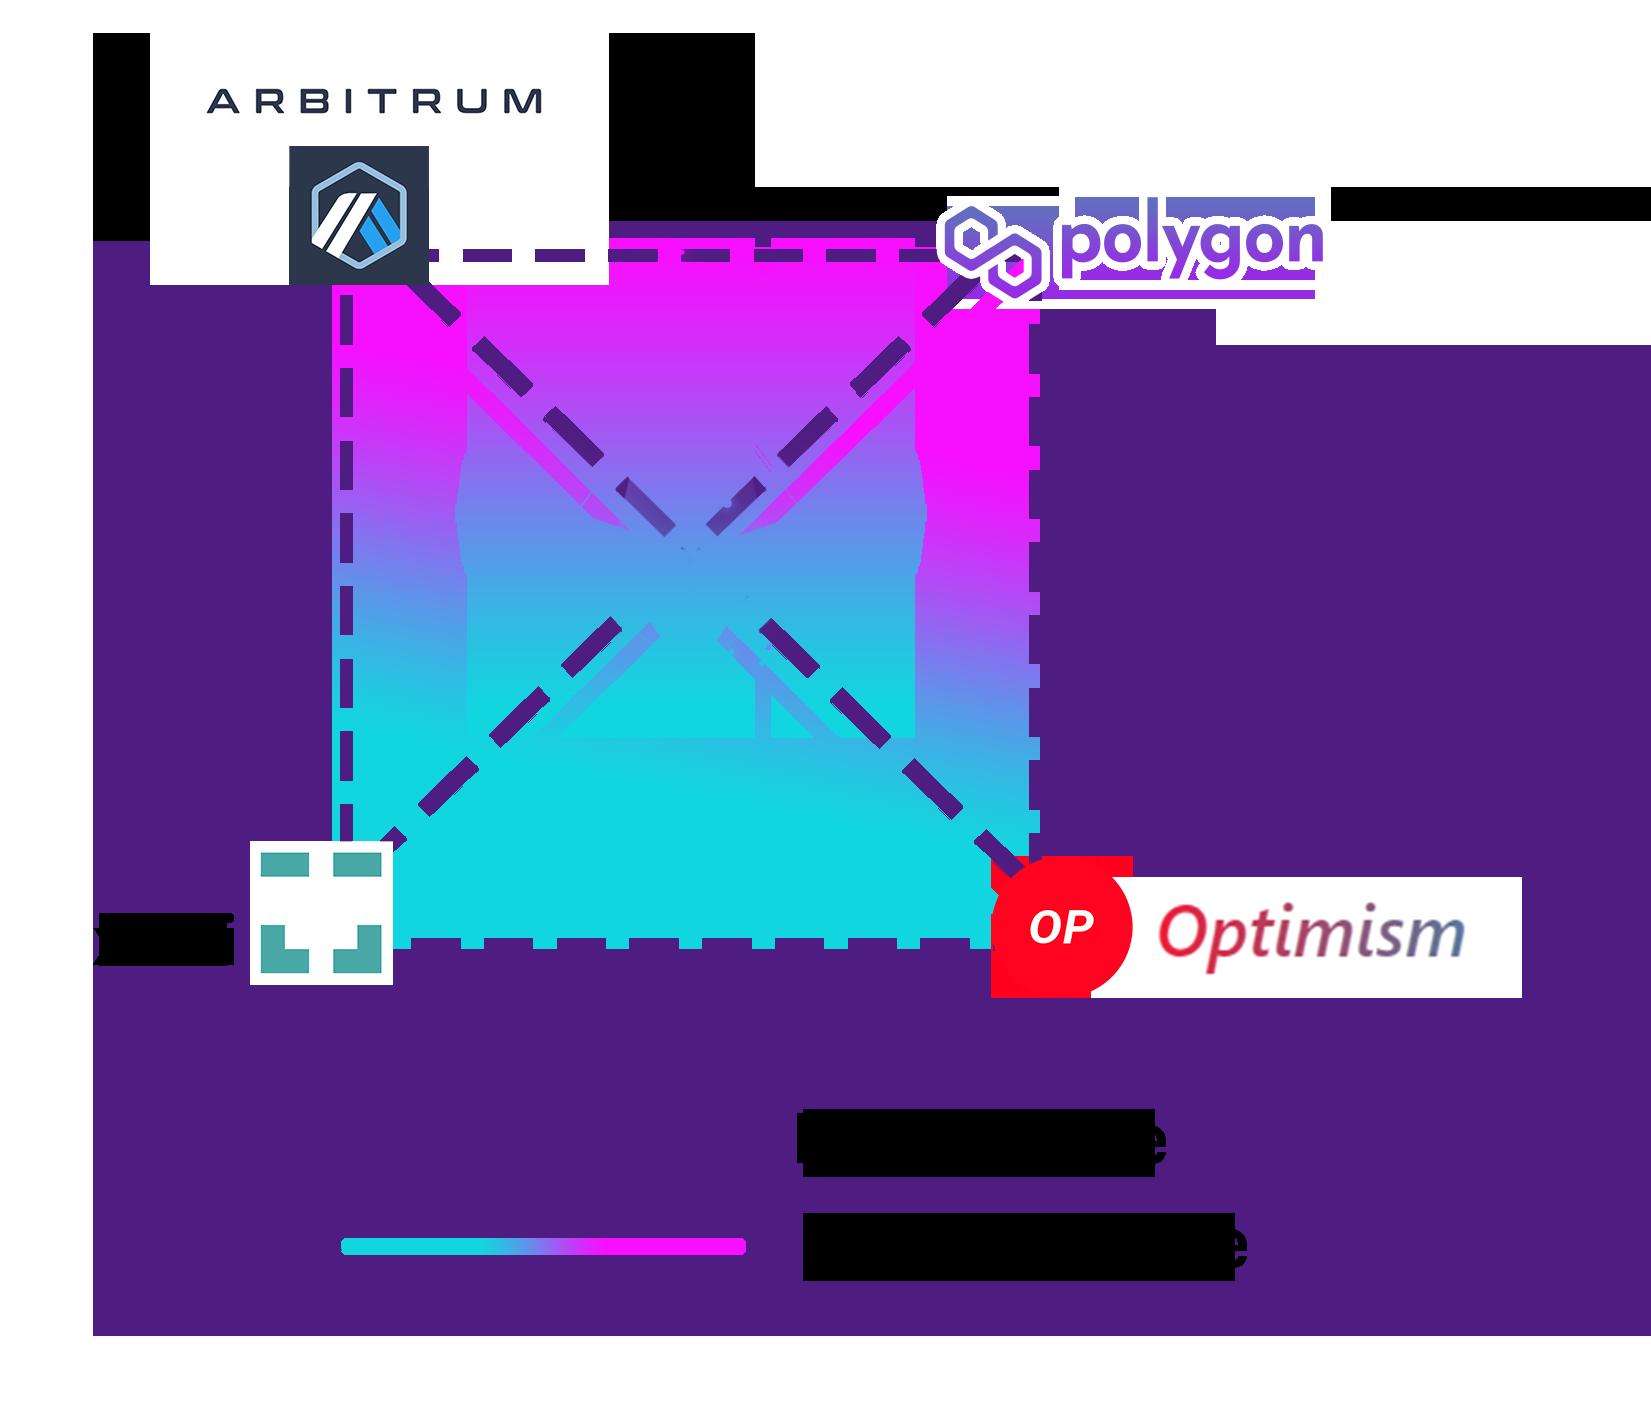 hop_protocol_layer_2_Ethereum_optimism_arbitrum_polygon_bridge (1).png